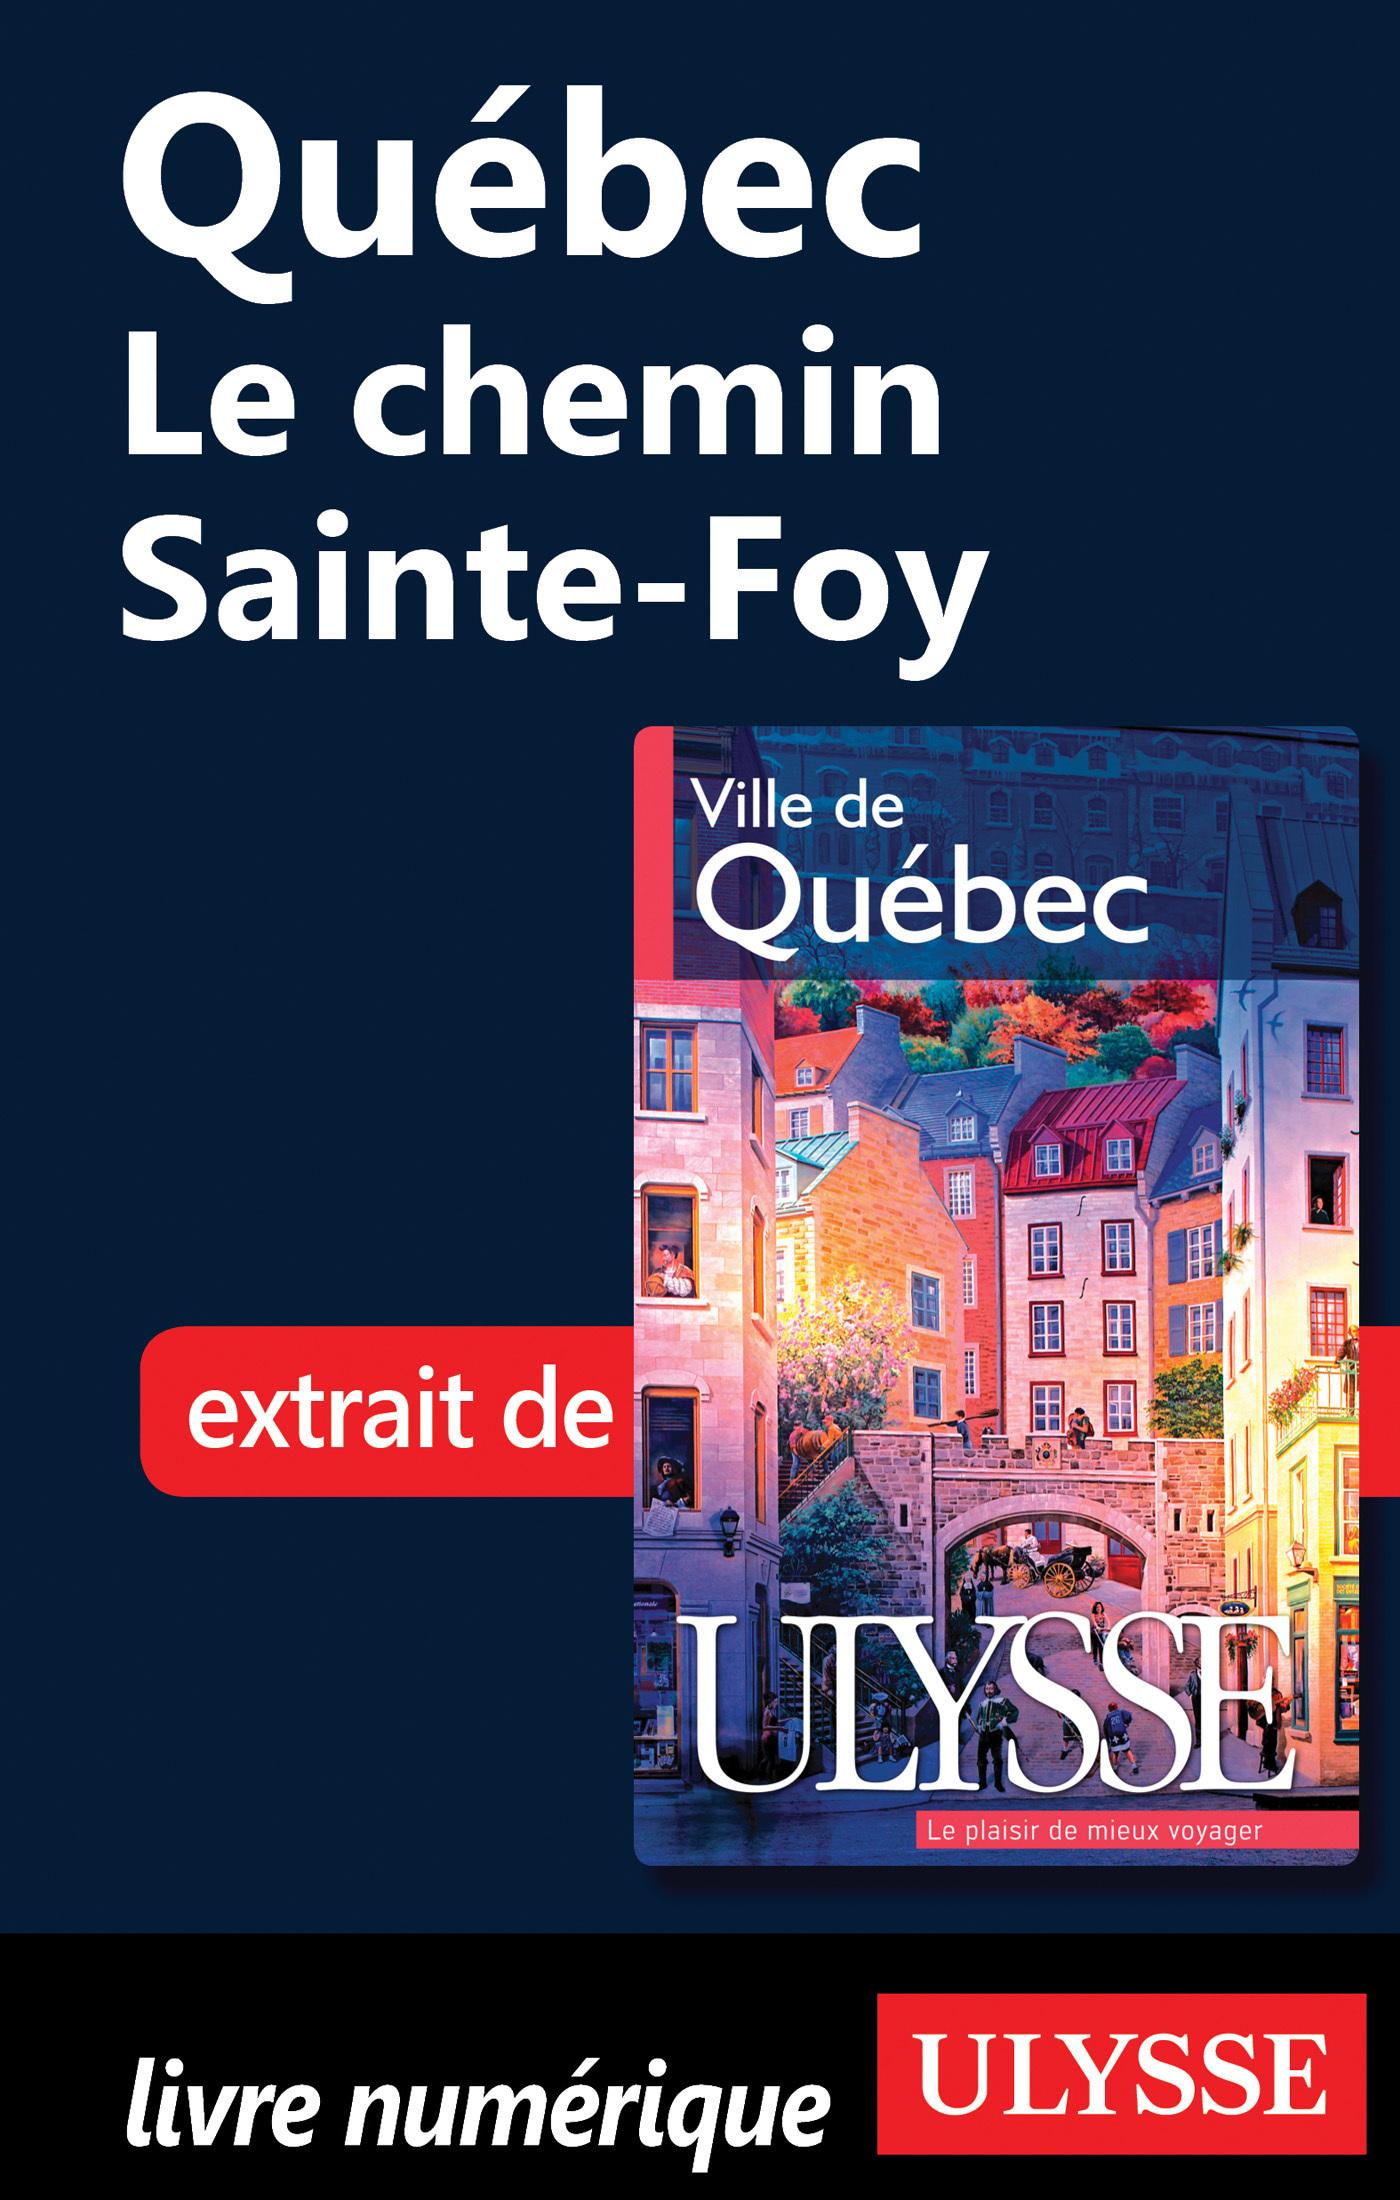 Québec : Le chemin Sainte-Foy